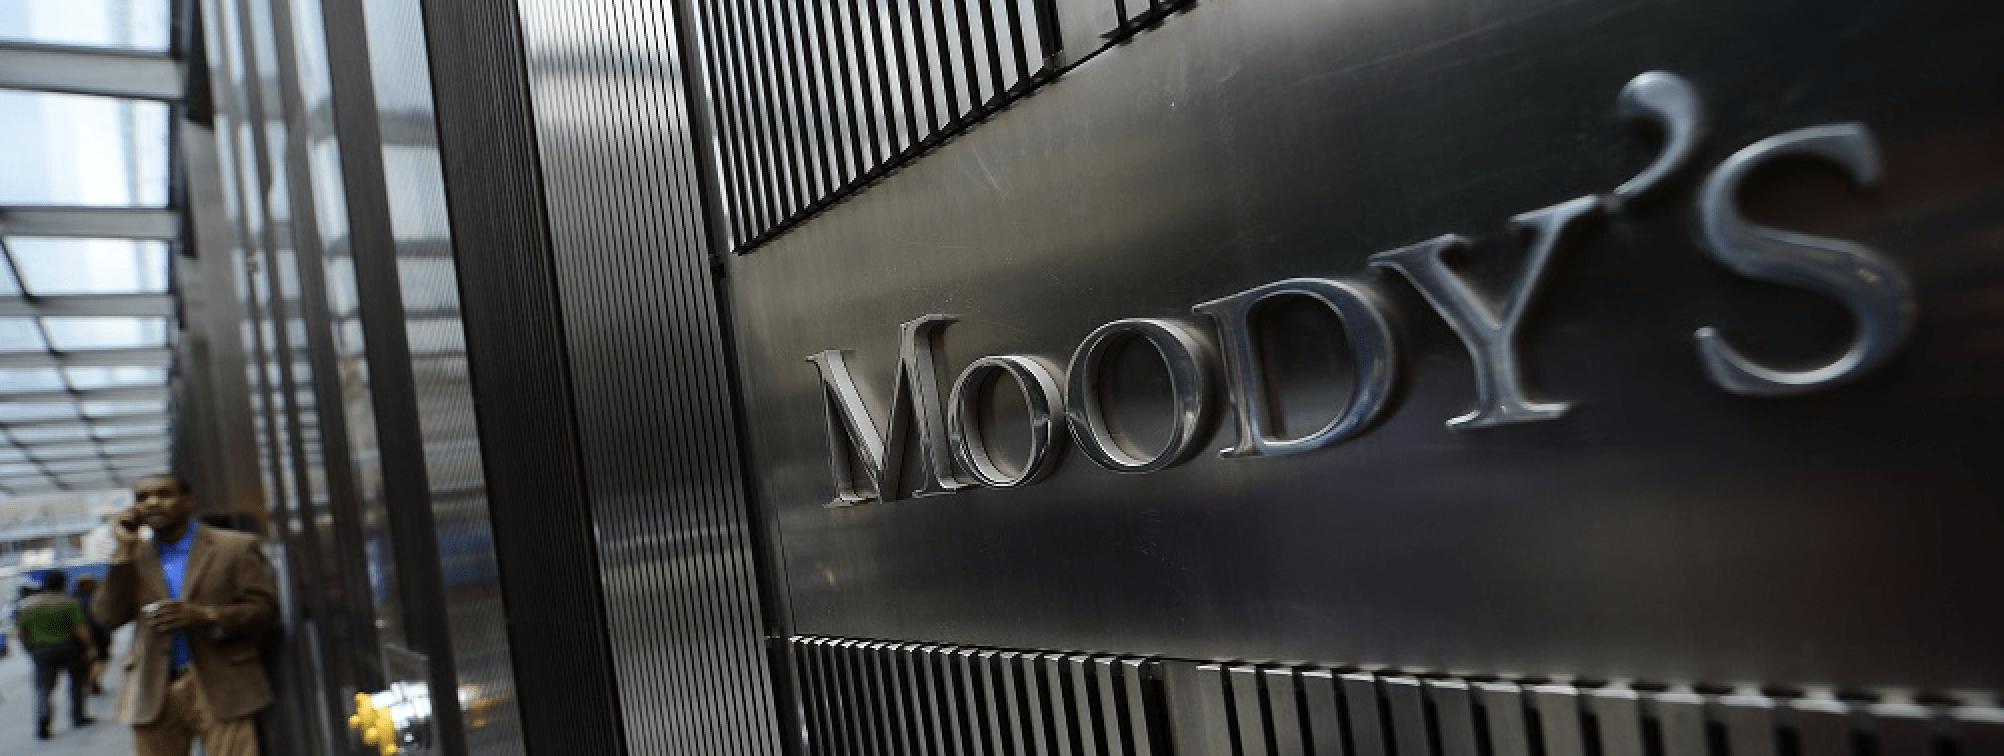 Moody's downgraded SA's credit rating, outlook negative